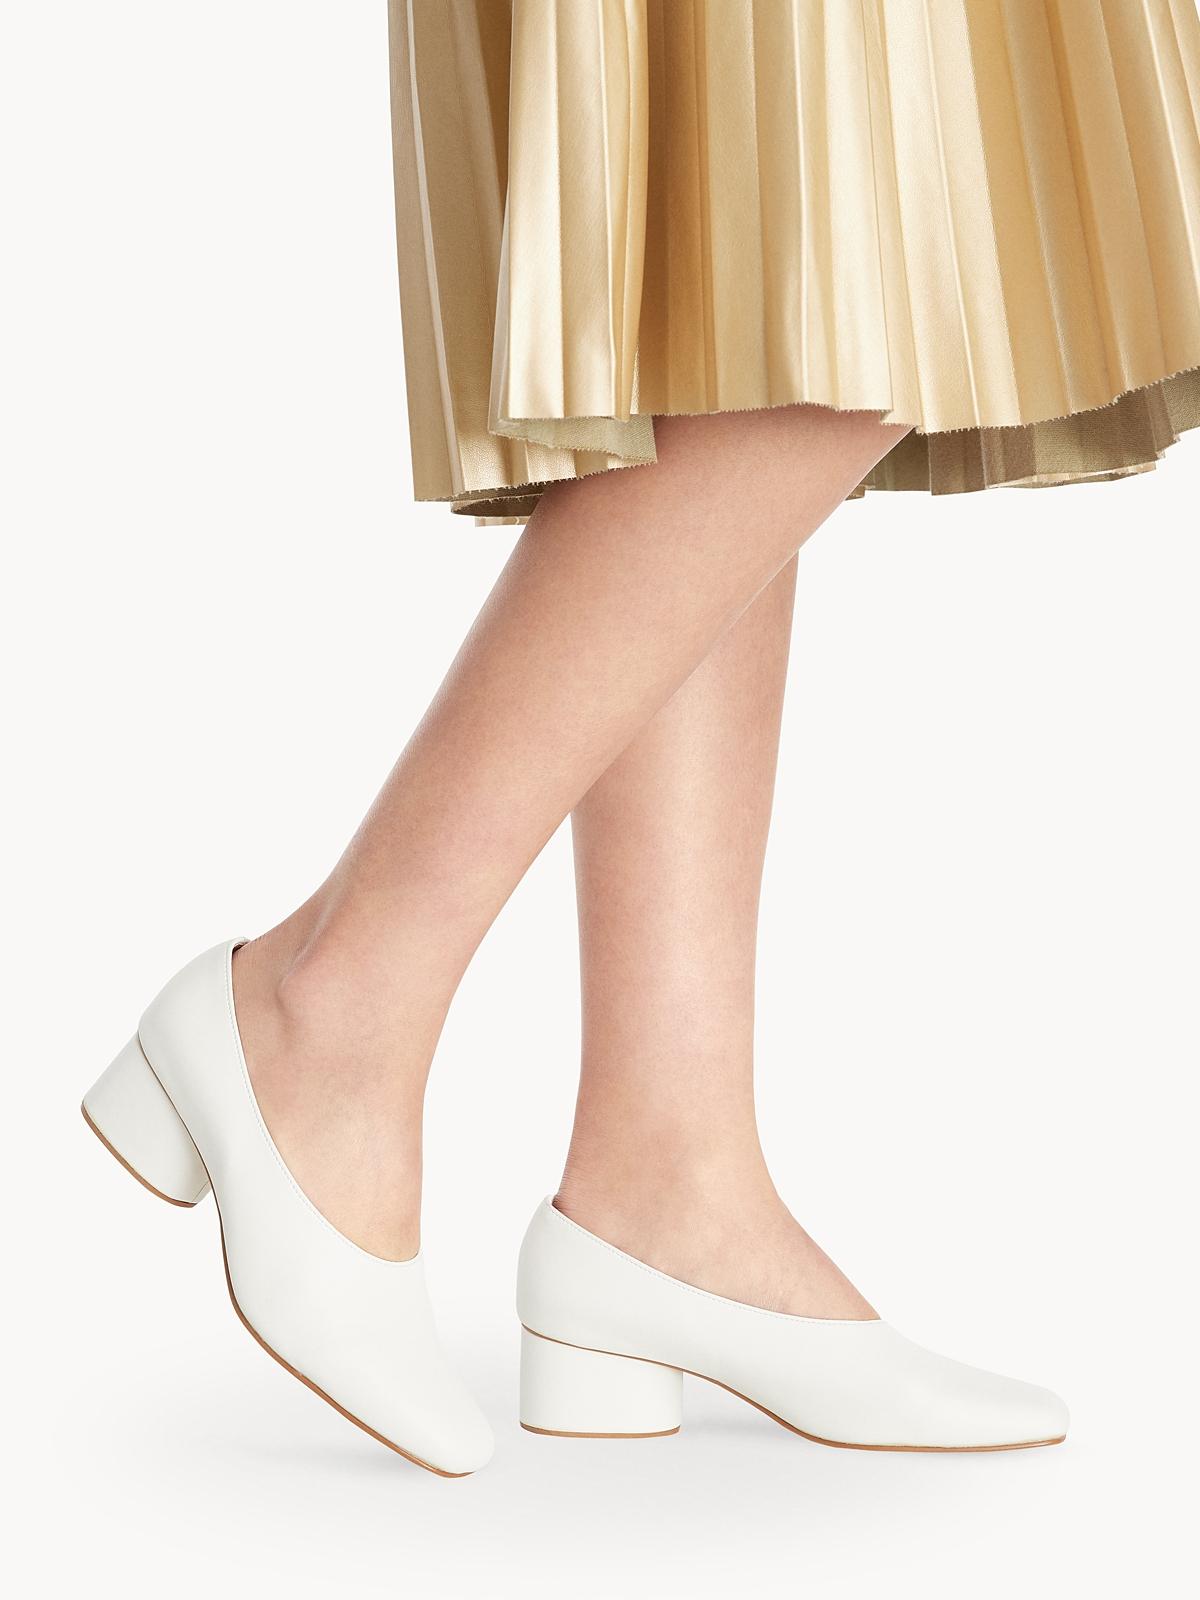 Tuntiya Object Tia Block Heels White